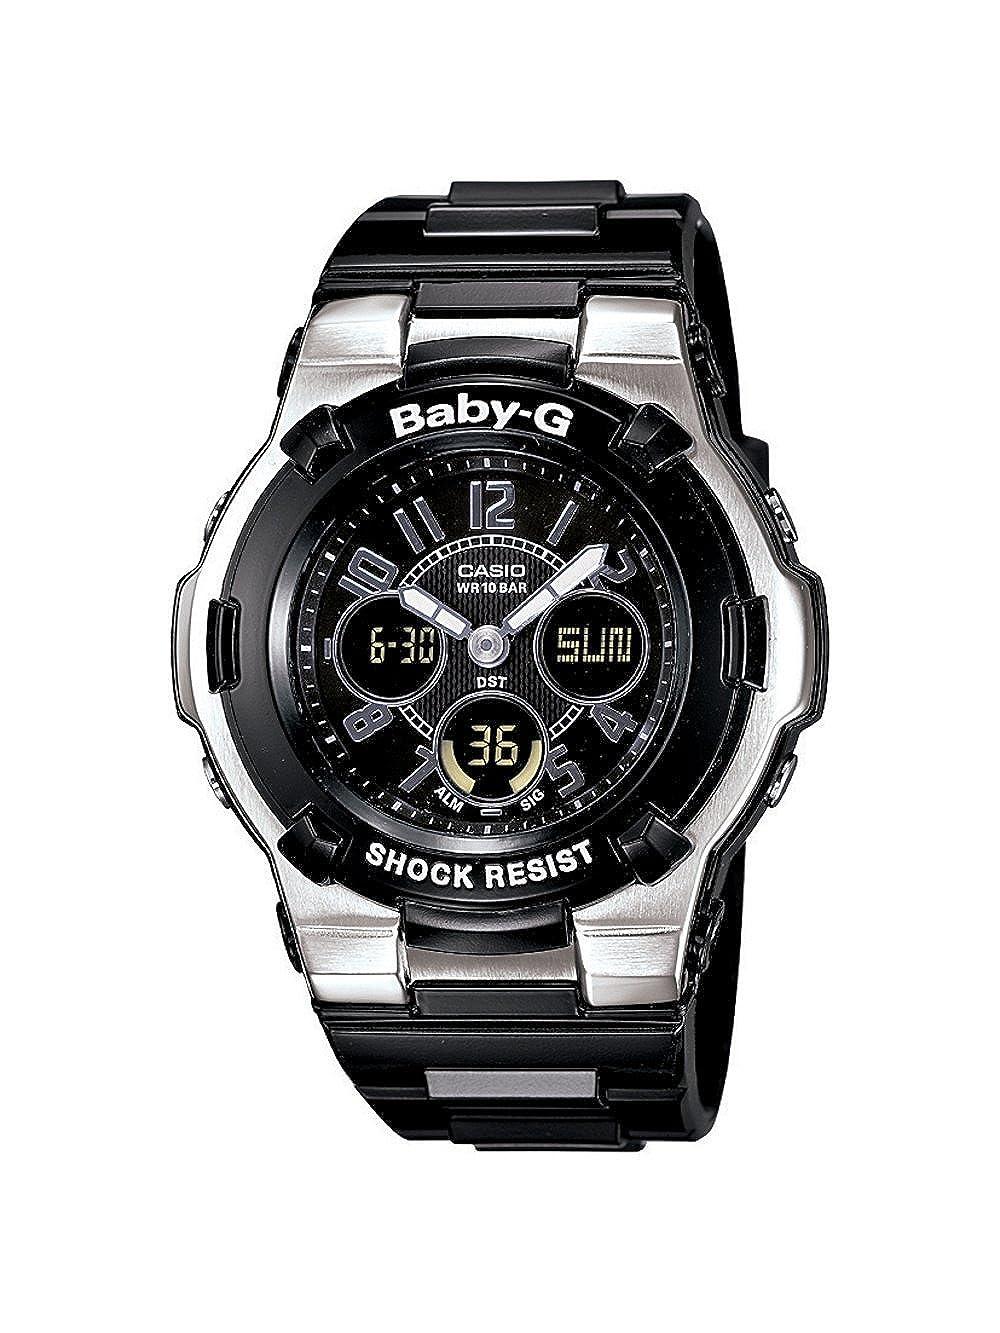 0d88d864fd6e Amazon.com  Casio Women s BGA110-1B2 Baby-G Shock Resistant Black  Multi-Function Sport Watch  Casio  Watches